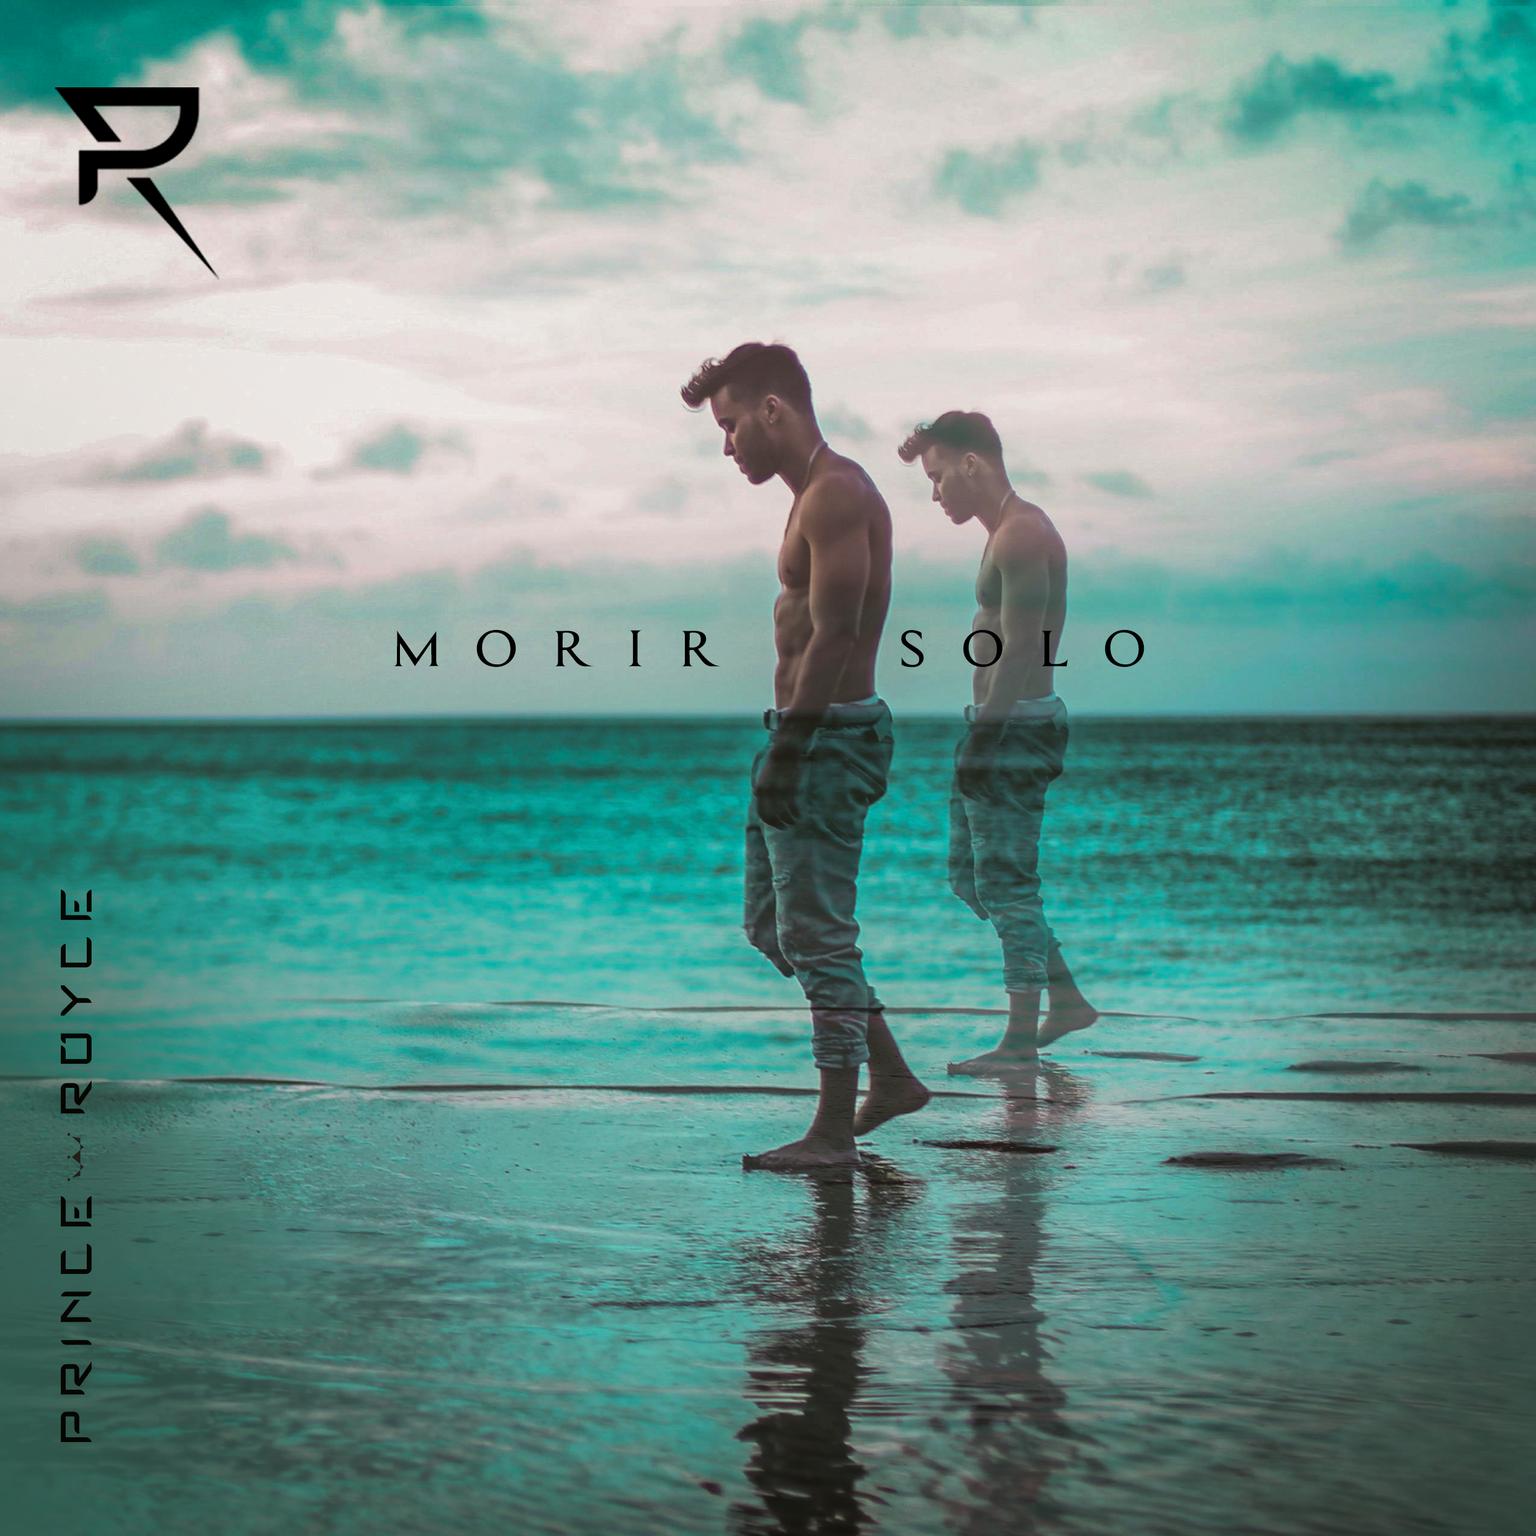 PrinceRoyce_MorirSolo_Cover